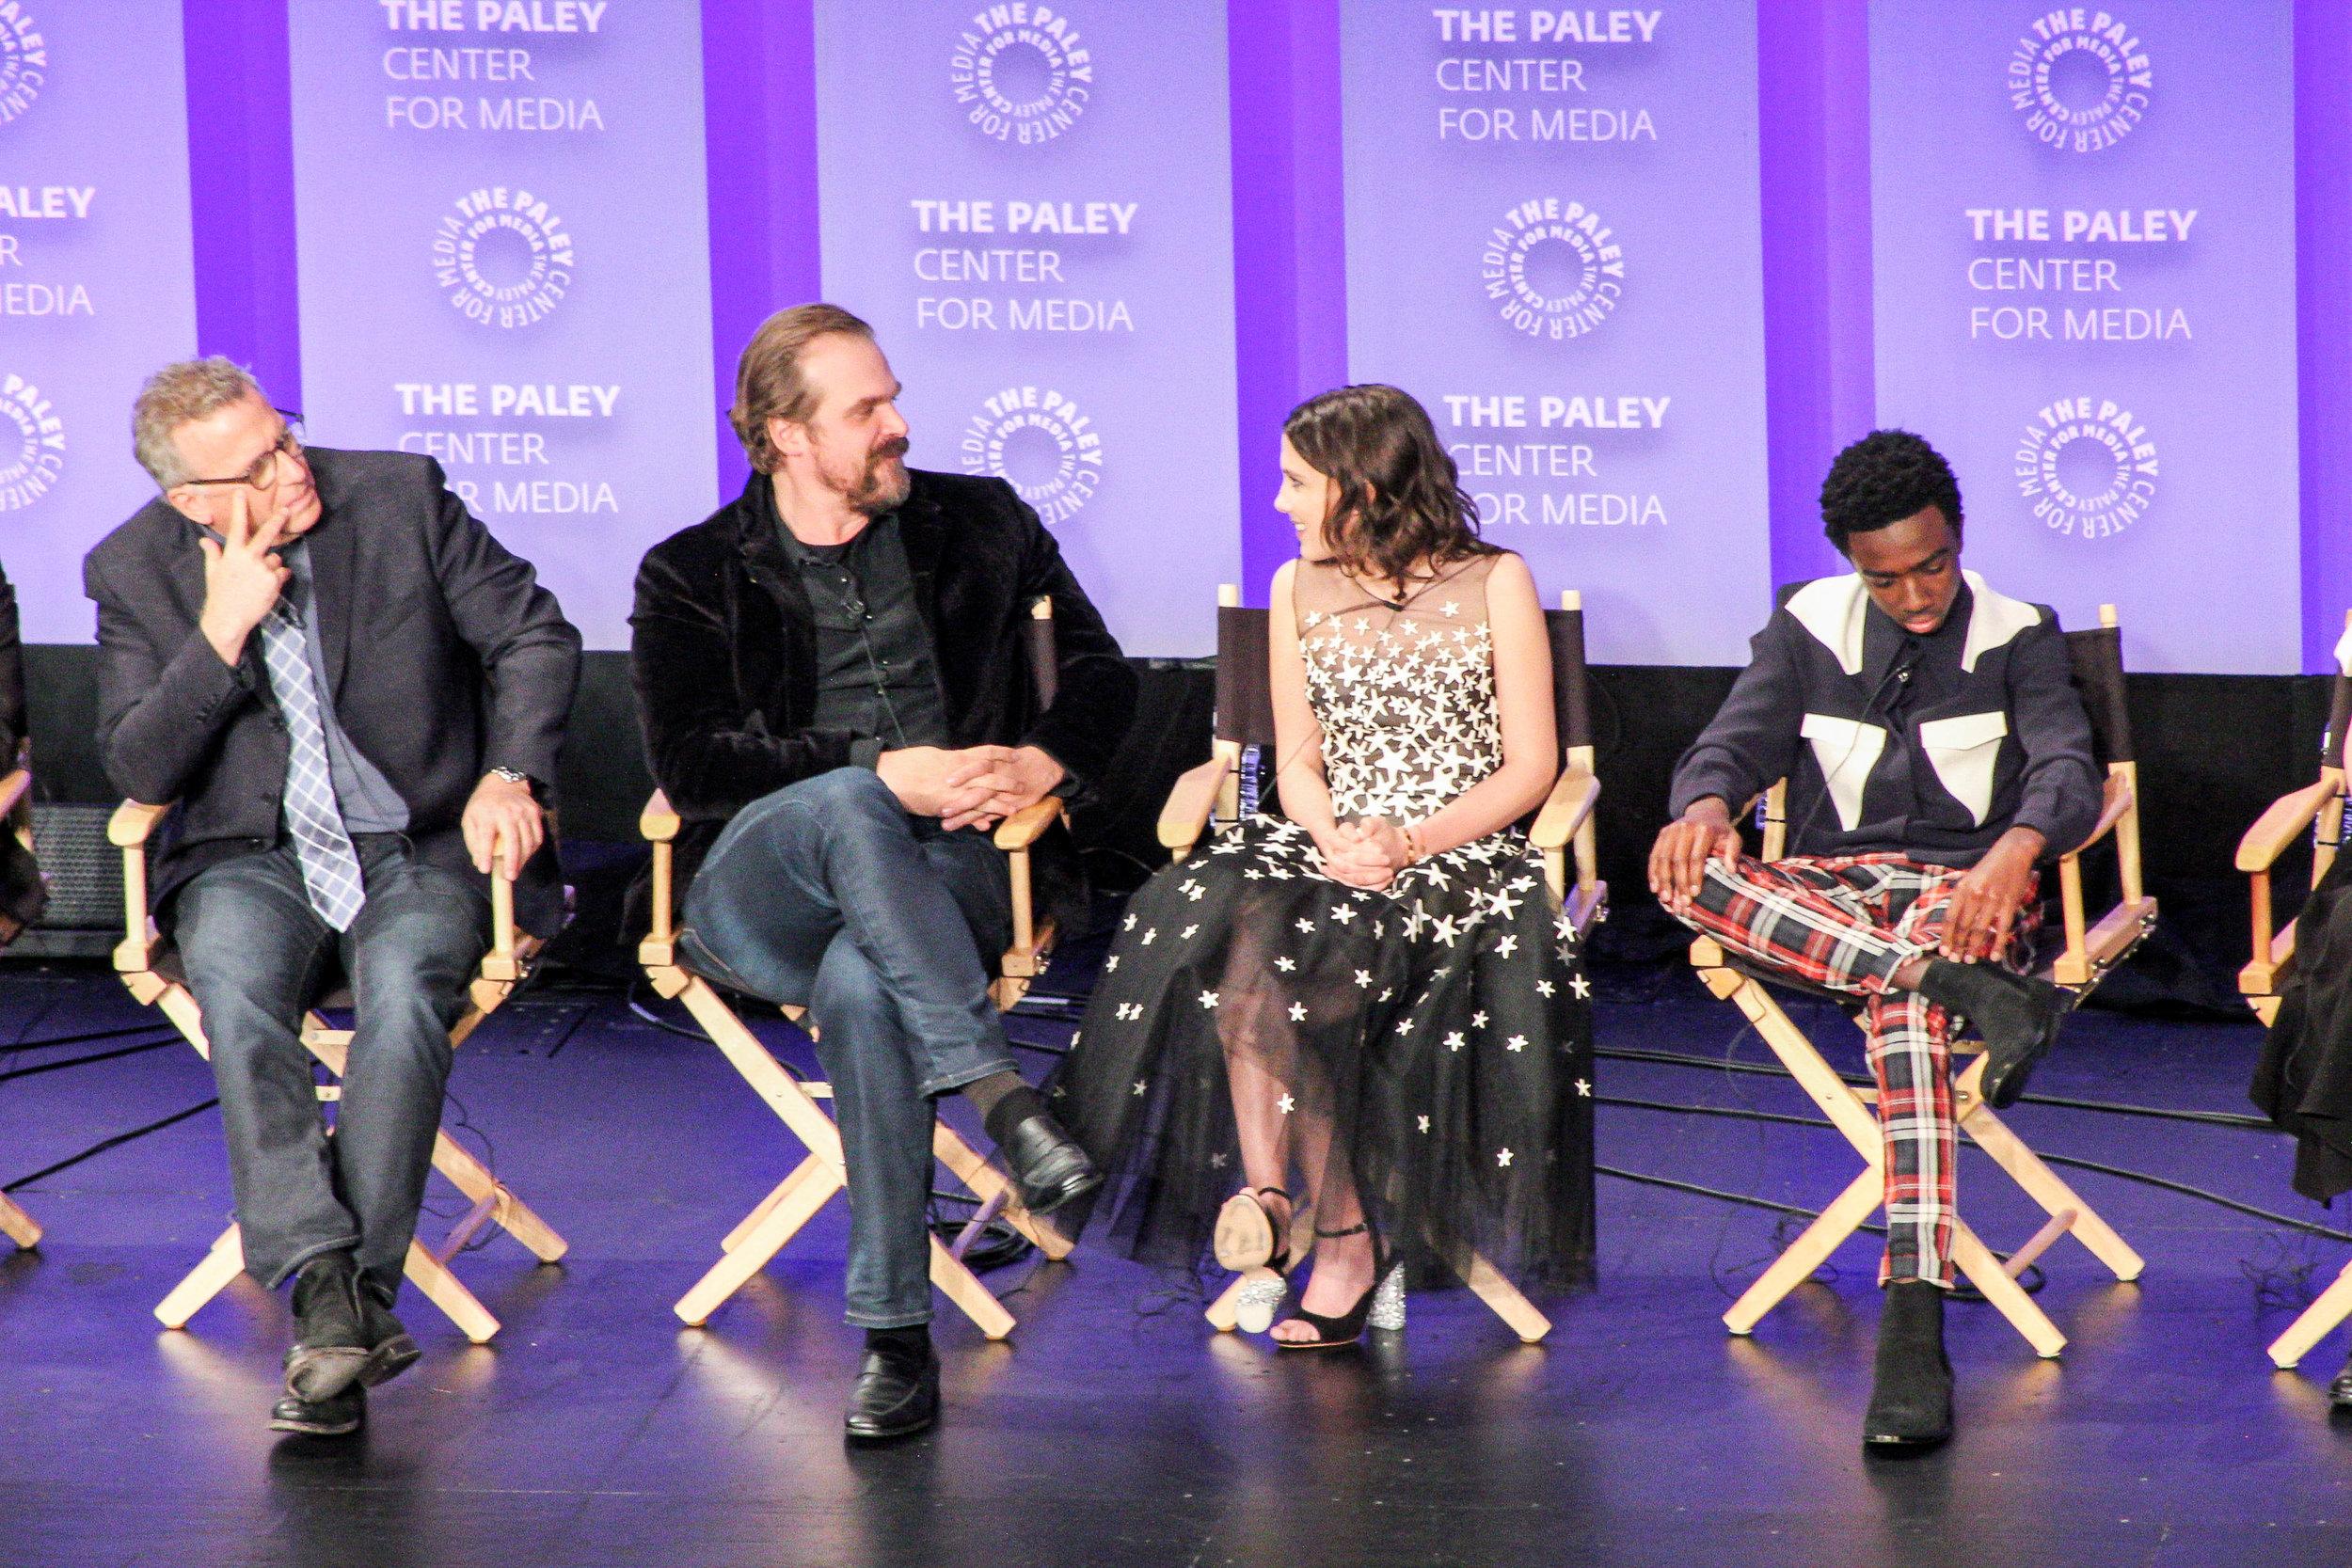 From left to right: Paul Reiser (Dr Sam Owens), David Harbour (Jim Hopper), Millie Bobby Brown (Eleven/Jane Hopper), and Caleb McLaughlin (Lucas Sinclair)